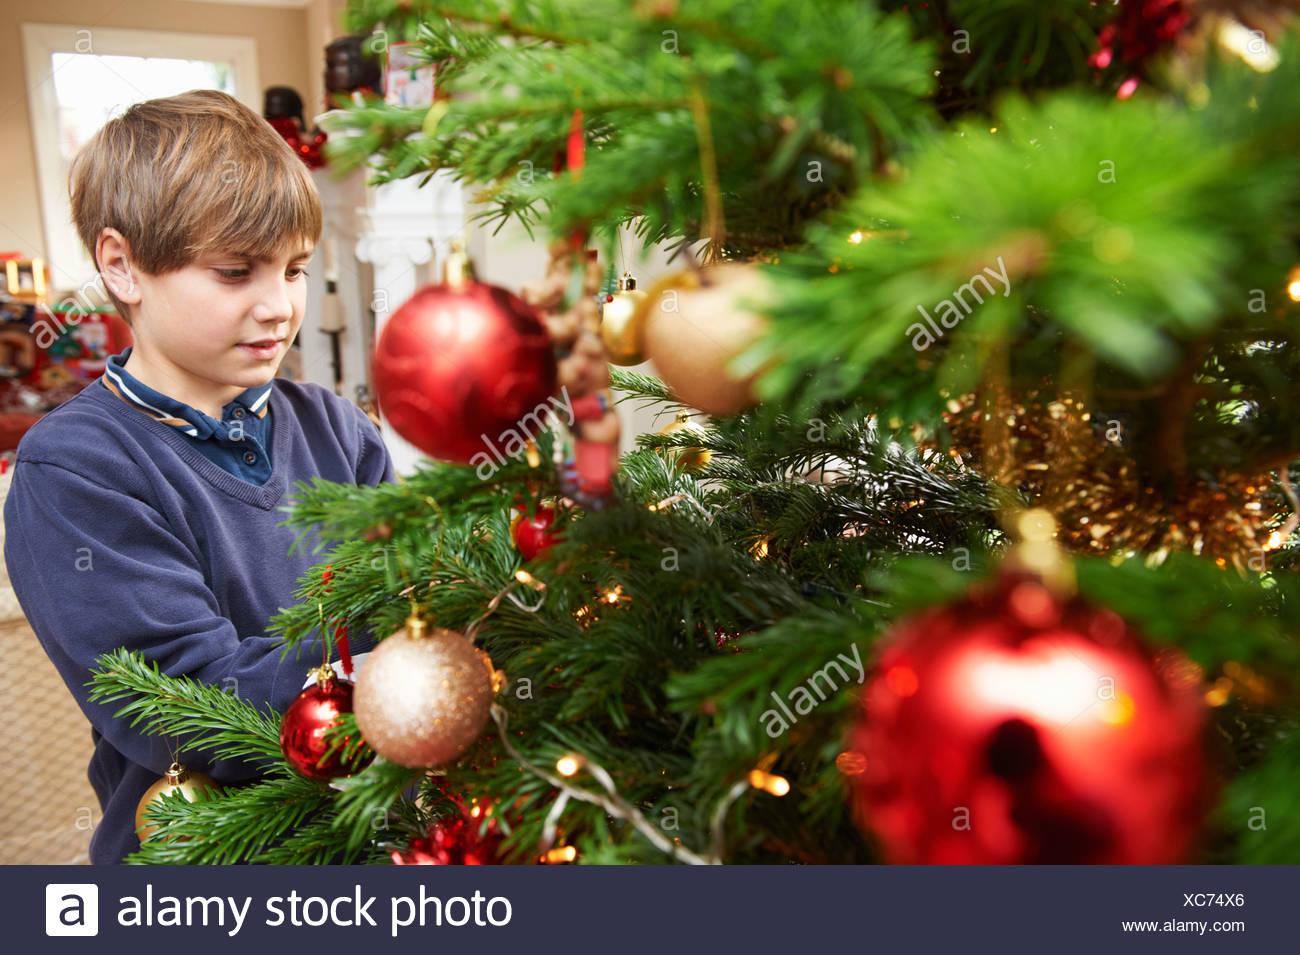 Boy decorating Christmas tree - Stock Image